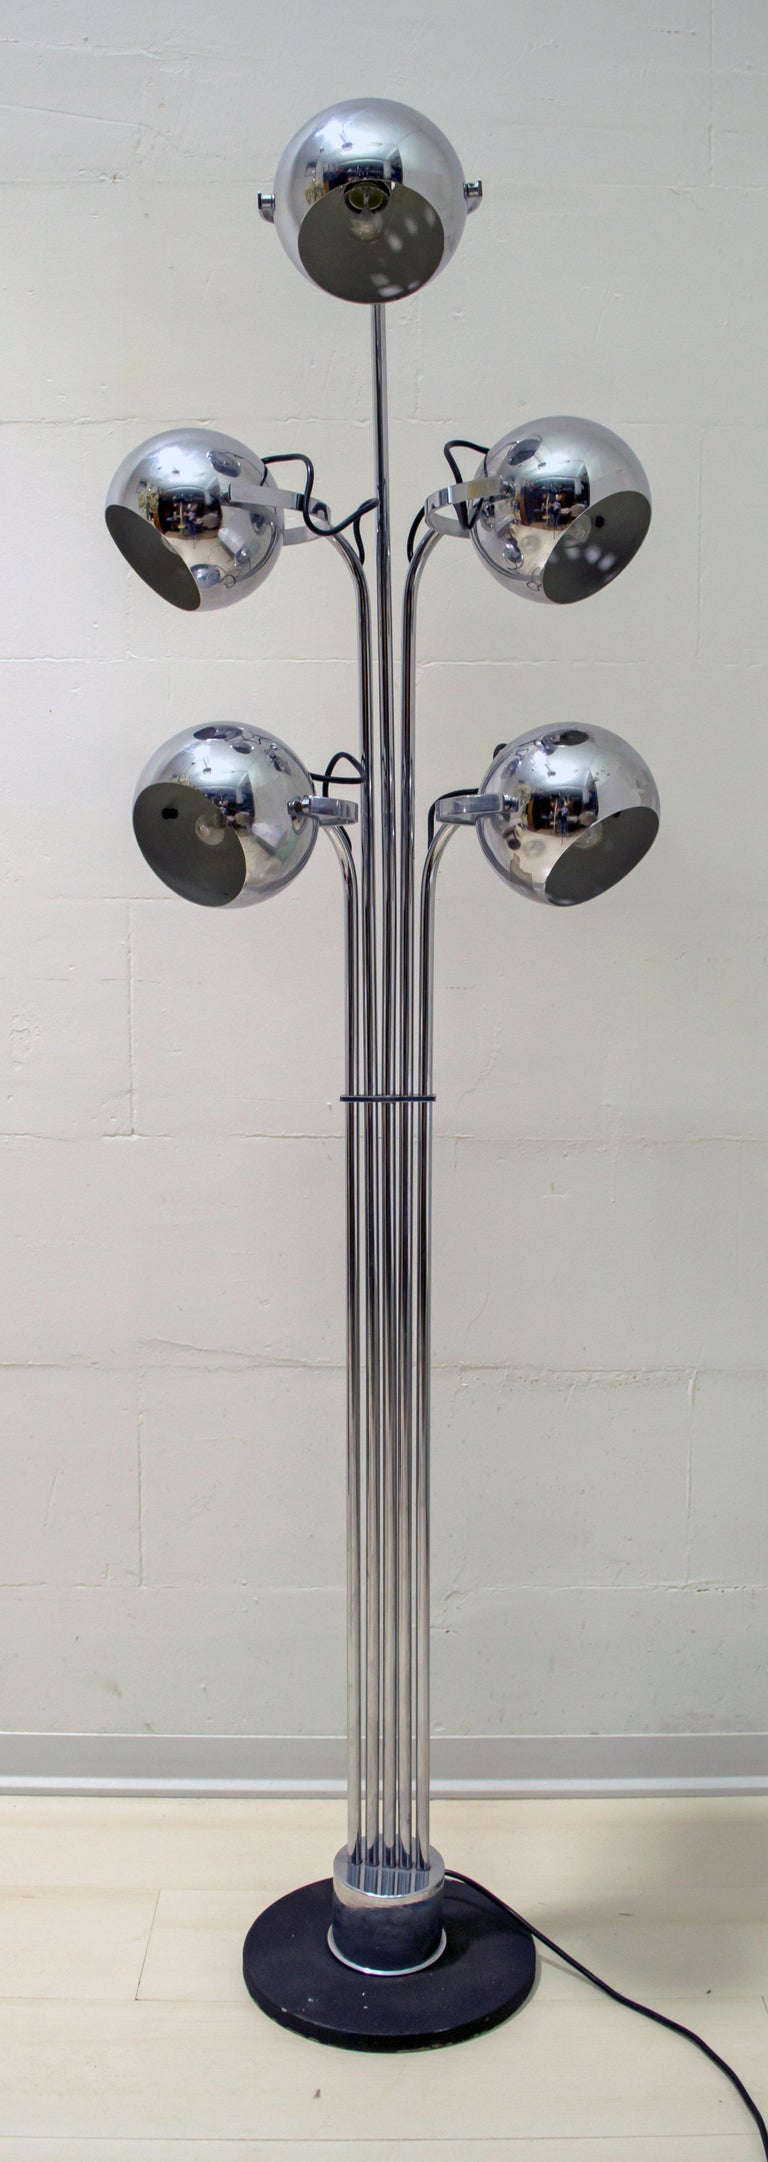 Goffredo Reggiani Mid-Century Modern Italian 5 Lights Chrome Floor Lamp, 1970s In Good Condition For Sale In Cerignola, Italy Puglia